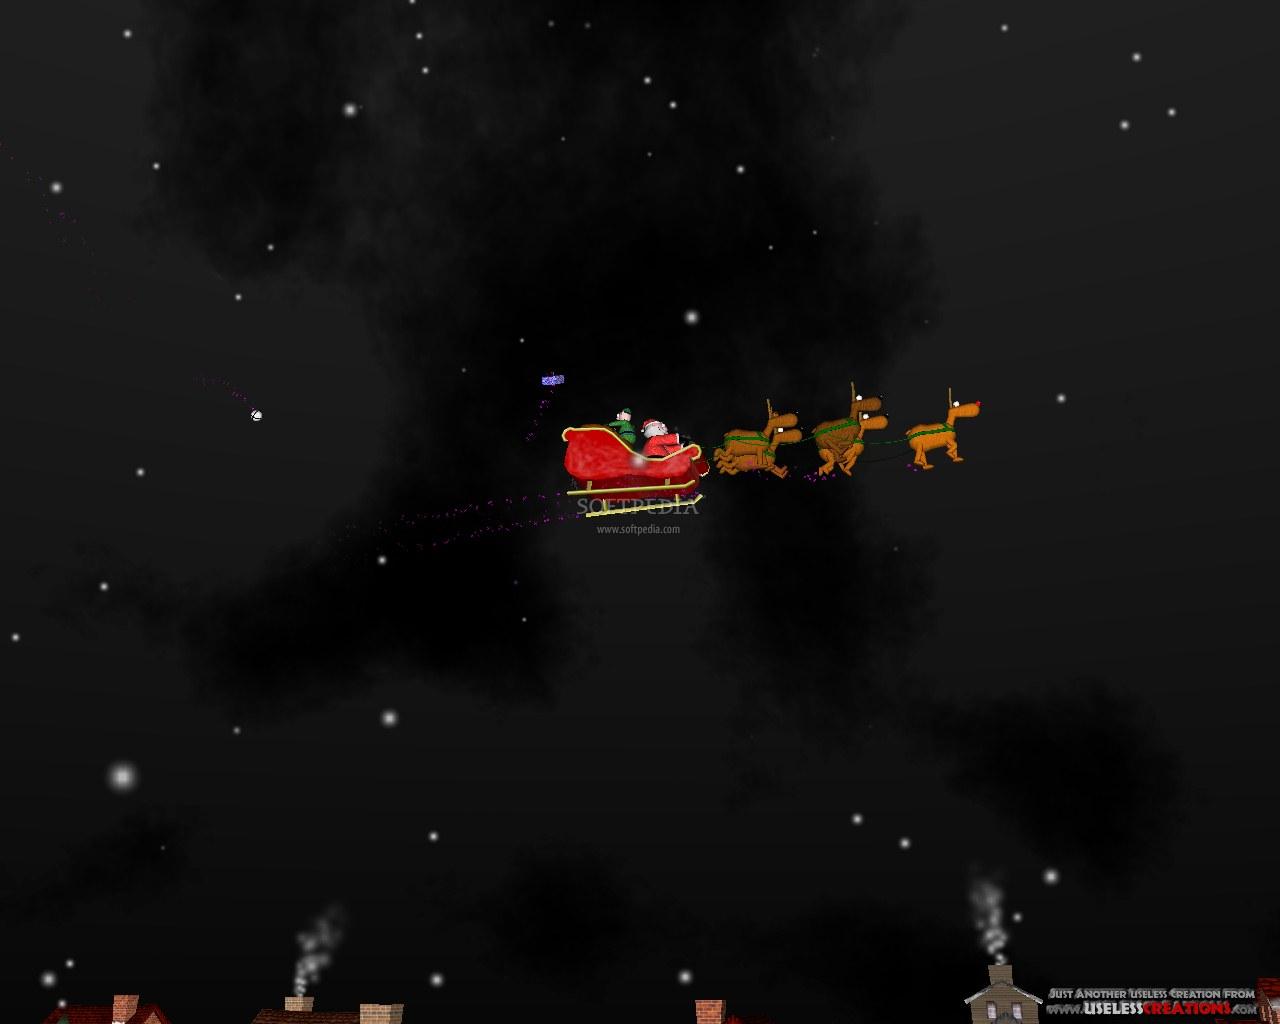 Screenshot 1 of A Very 3D Christmas Screensaver 1280x1024